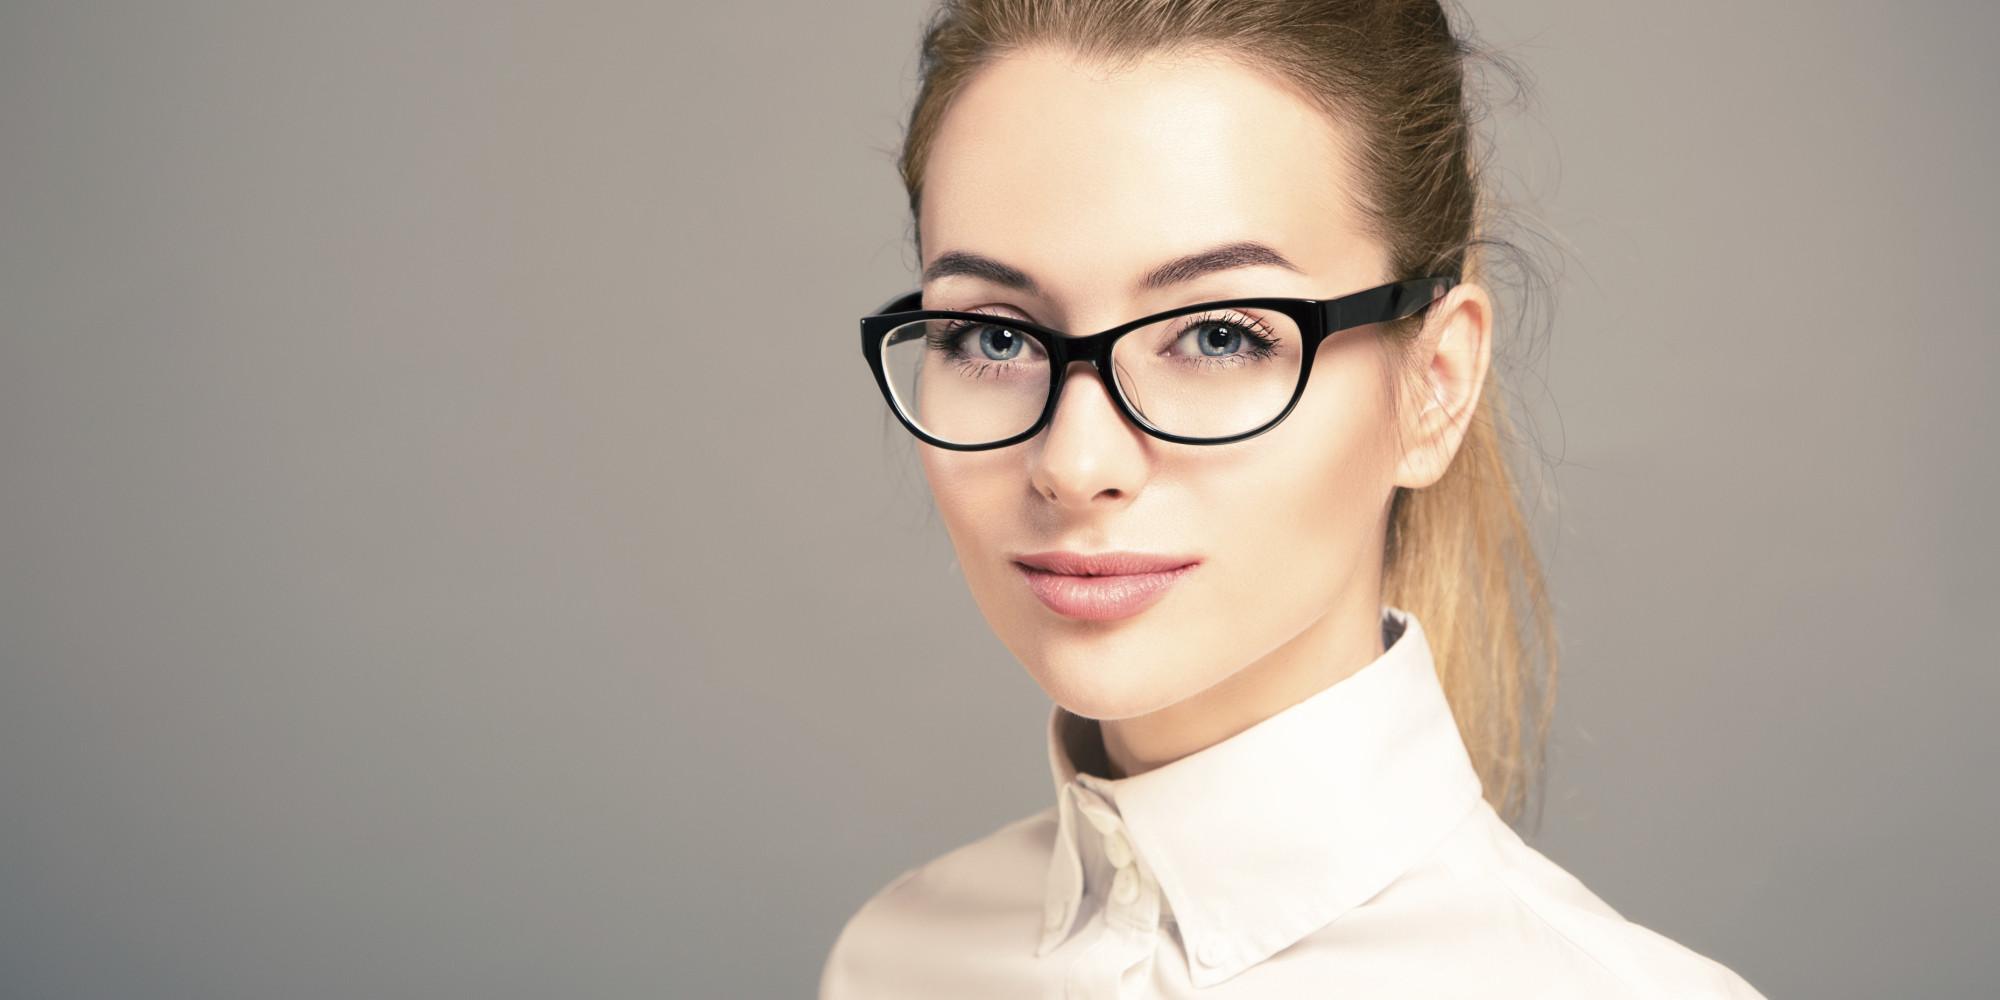 woman-in-black-glasses